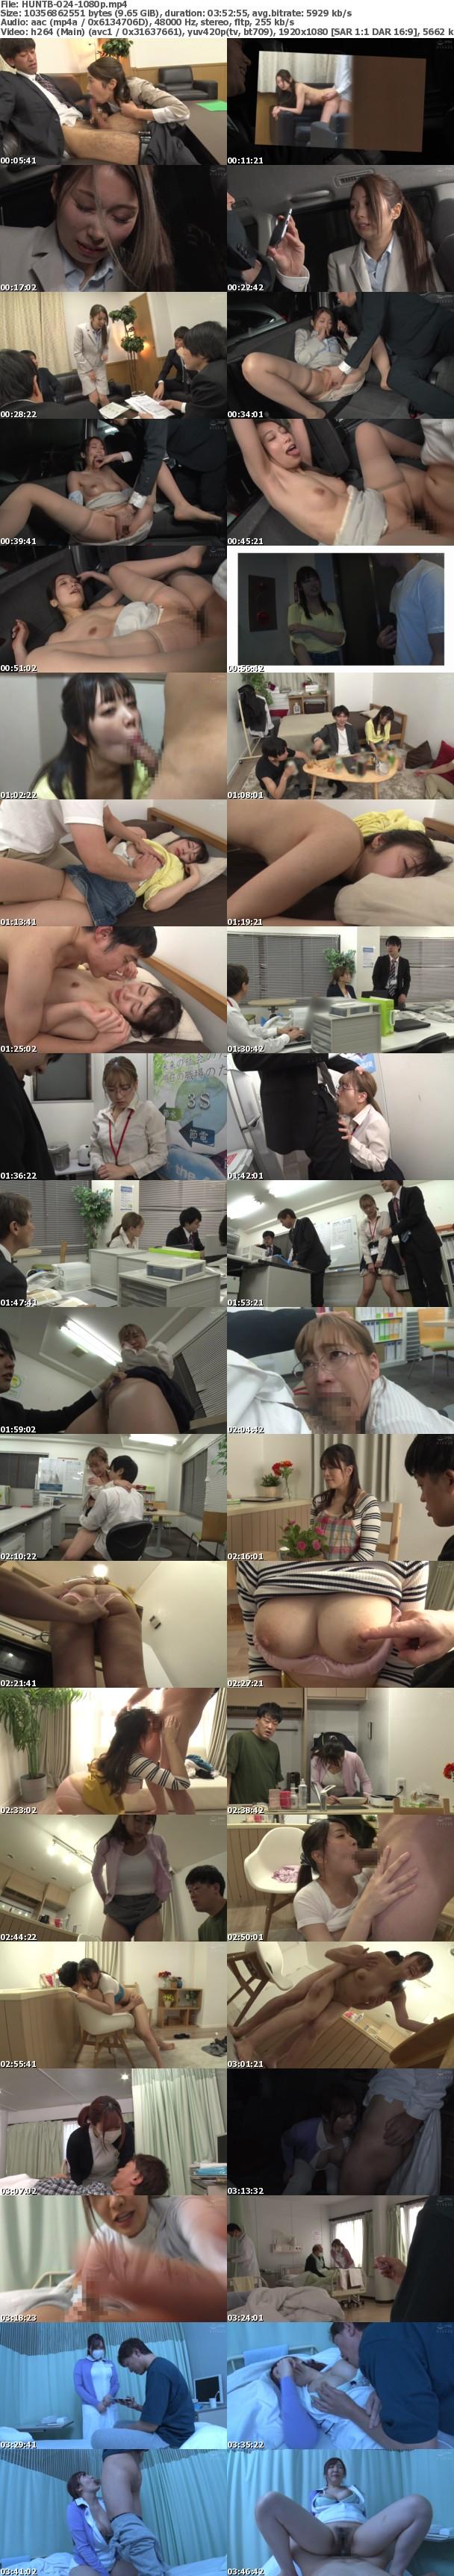 (Full HD) HUNTB-024 「お願いやめて!もう我慢できない!」弱みを握られた女子(女上司、看護師、友達の彼女…)はリモバイを仕込まれガクブル痙攣大量失禁!